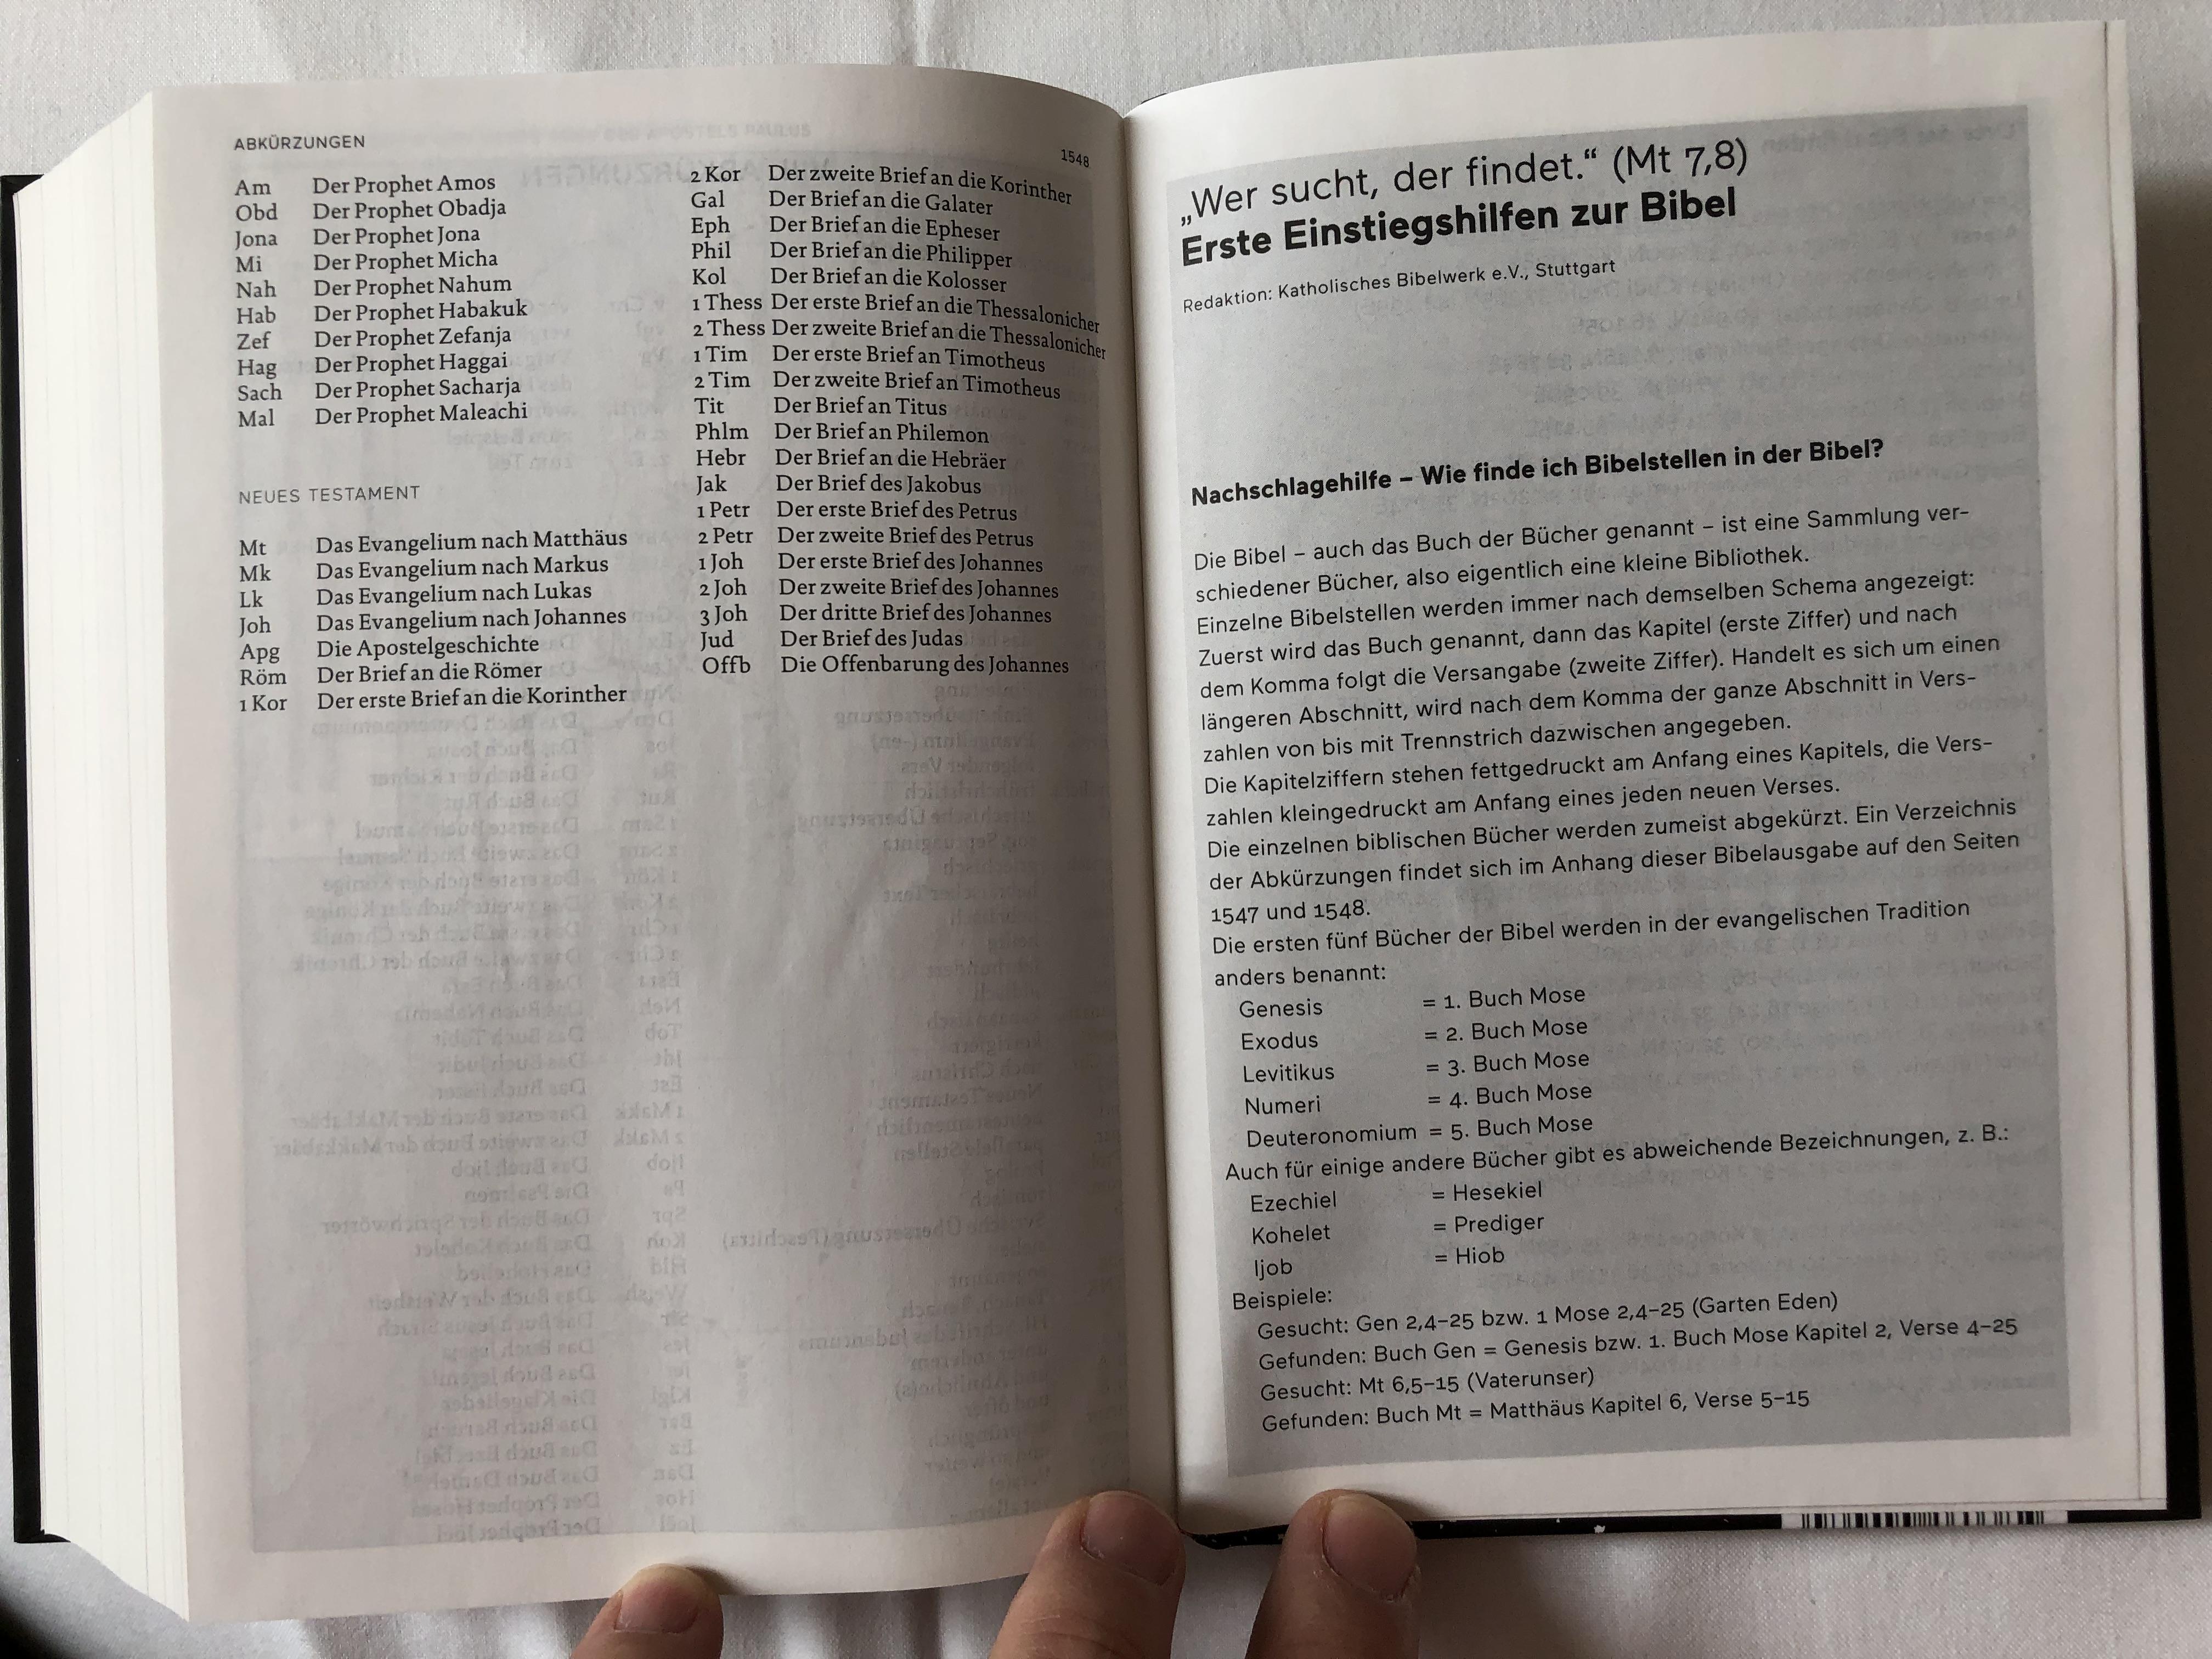 die-bibel-einheits-bersetzung-german-language-holy-bible-unitary-translation-contains-deuterocanonical-books-apocrypha-hardcover-2016-kbw-13-.jpg